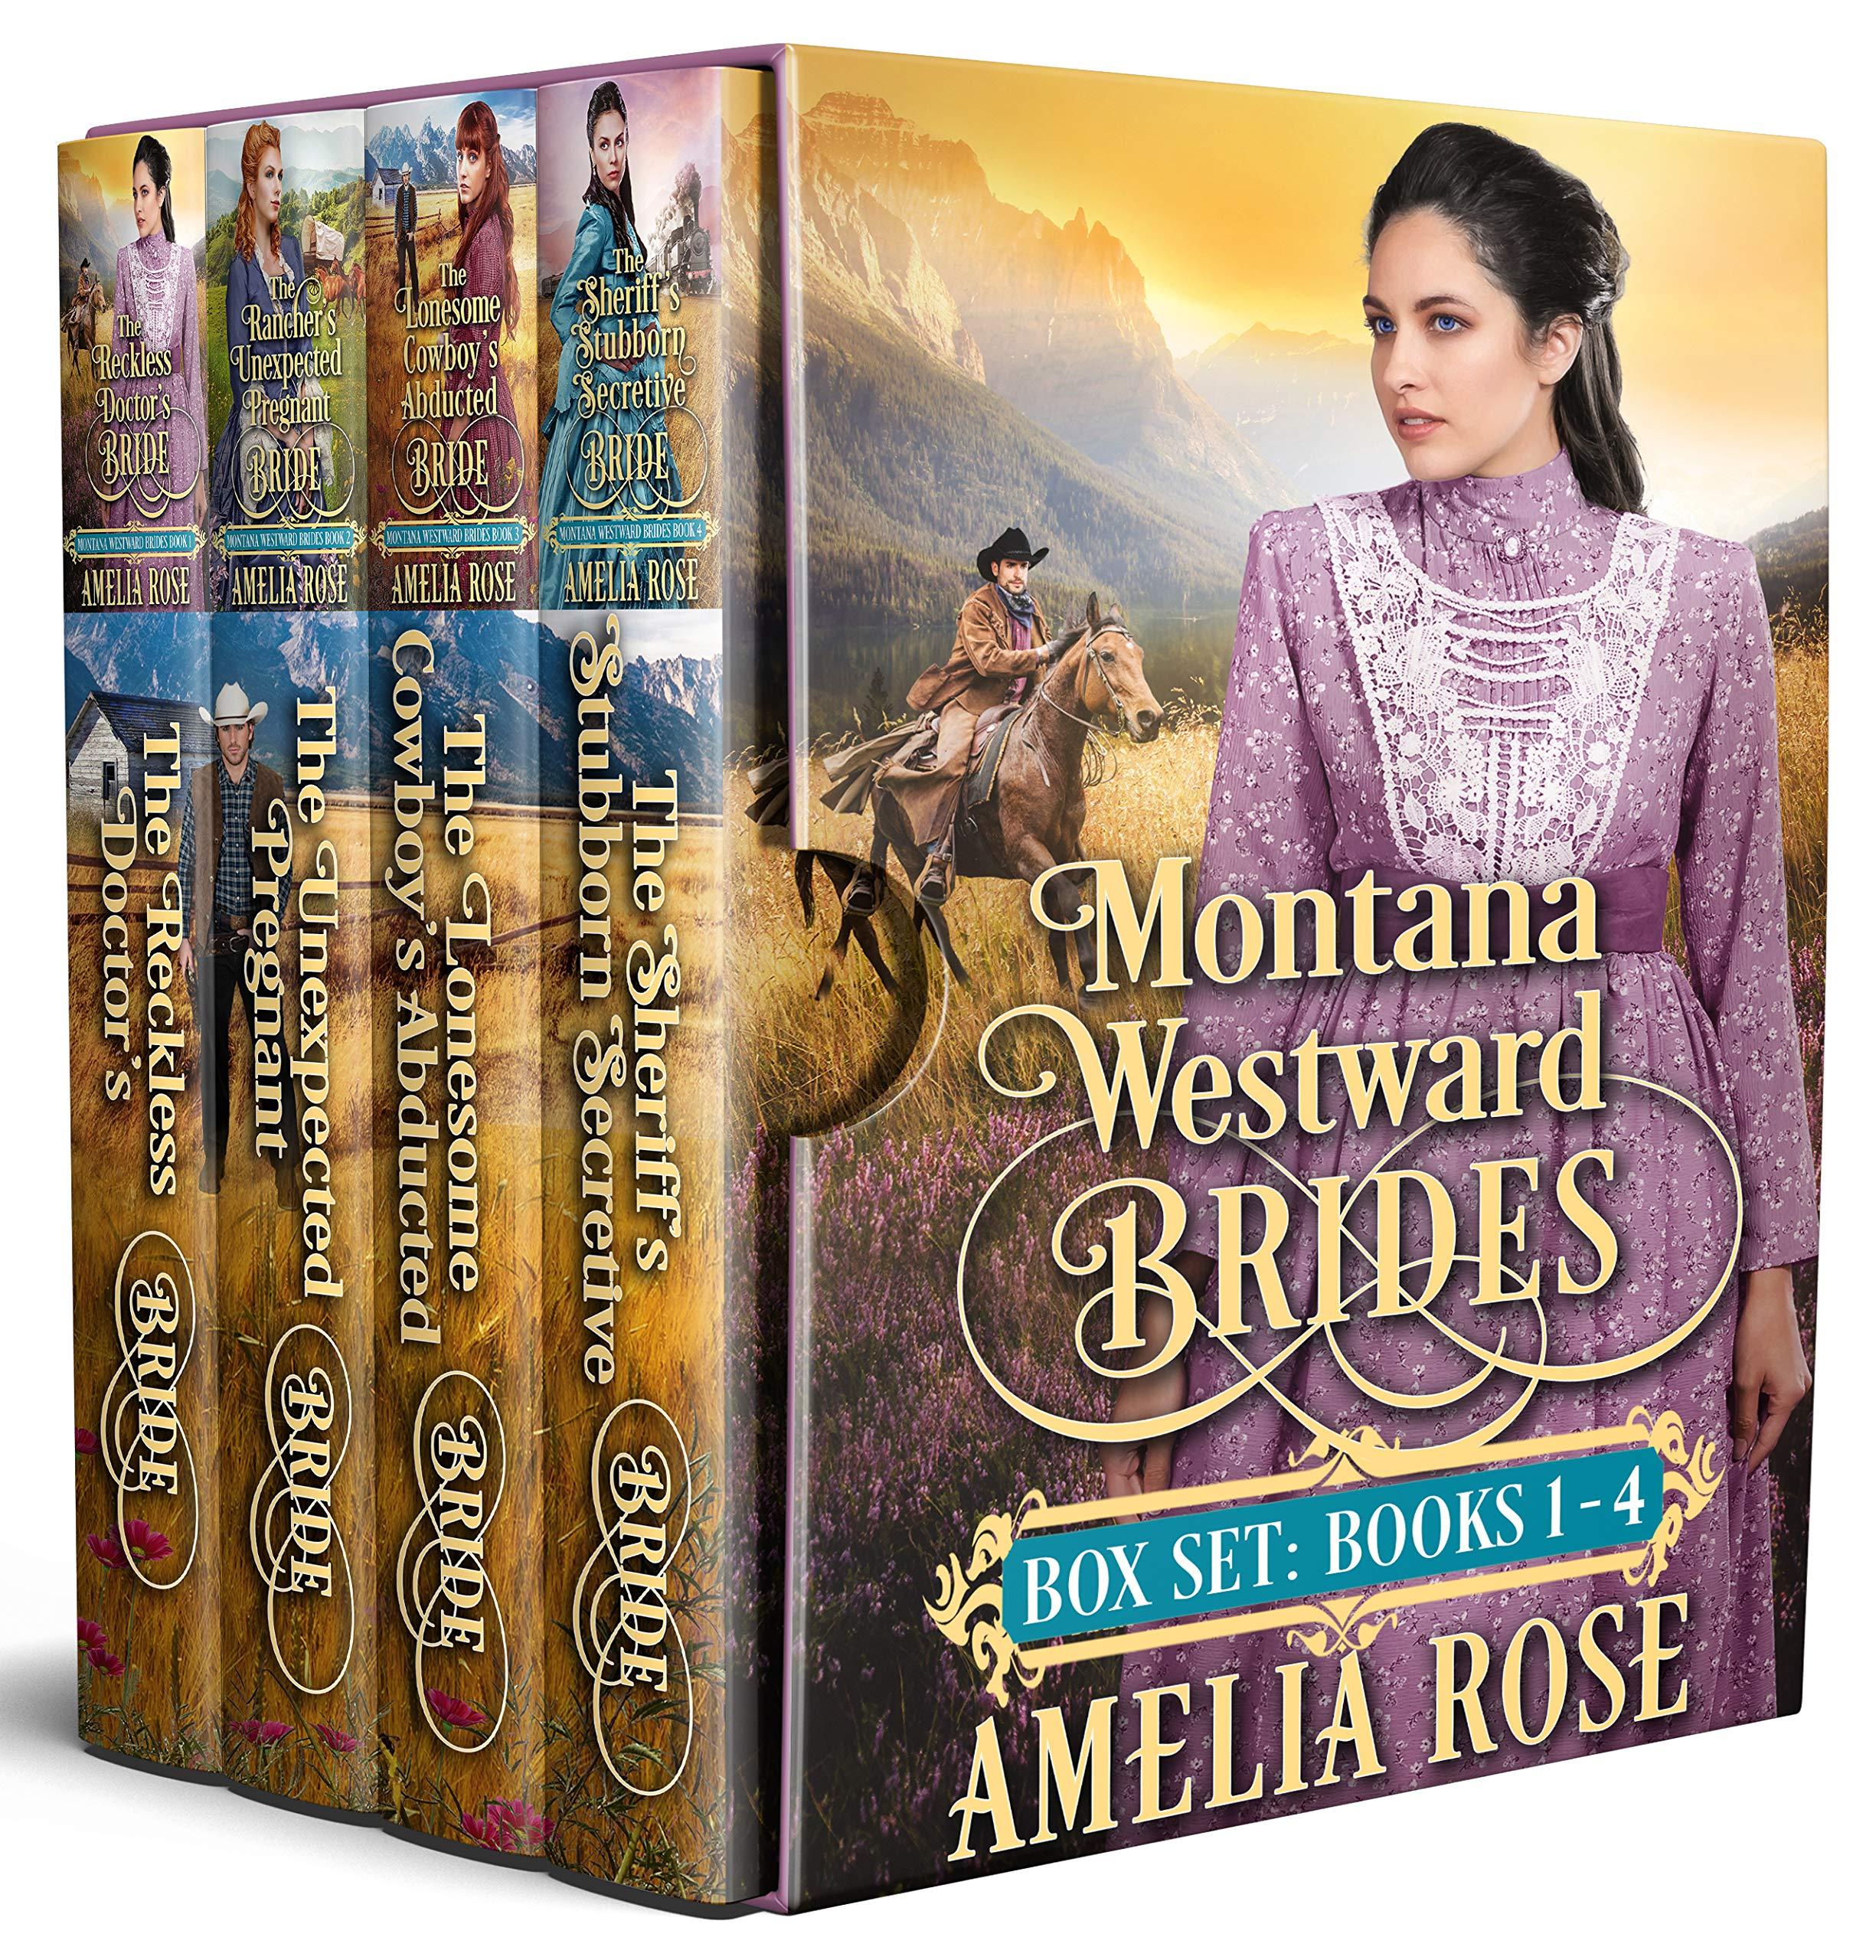 Montana Westward Brides Box Set: Books 1-4: Mail Order Bride Historical Western Romance